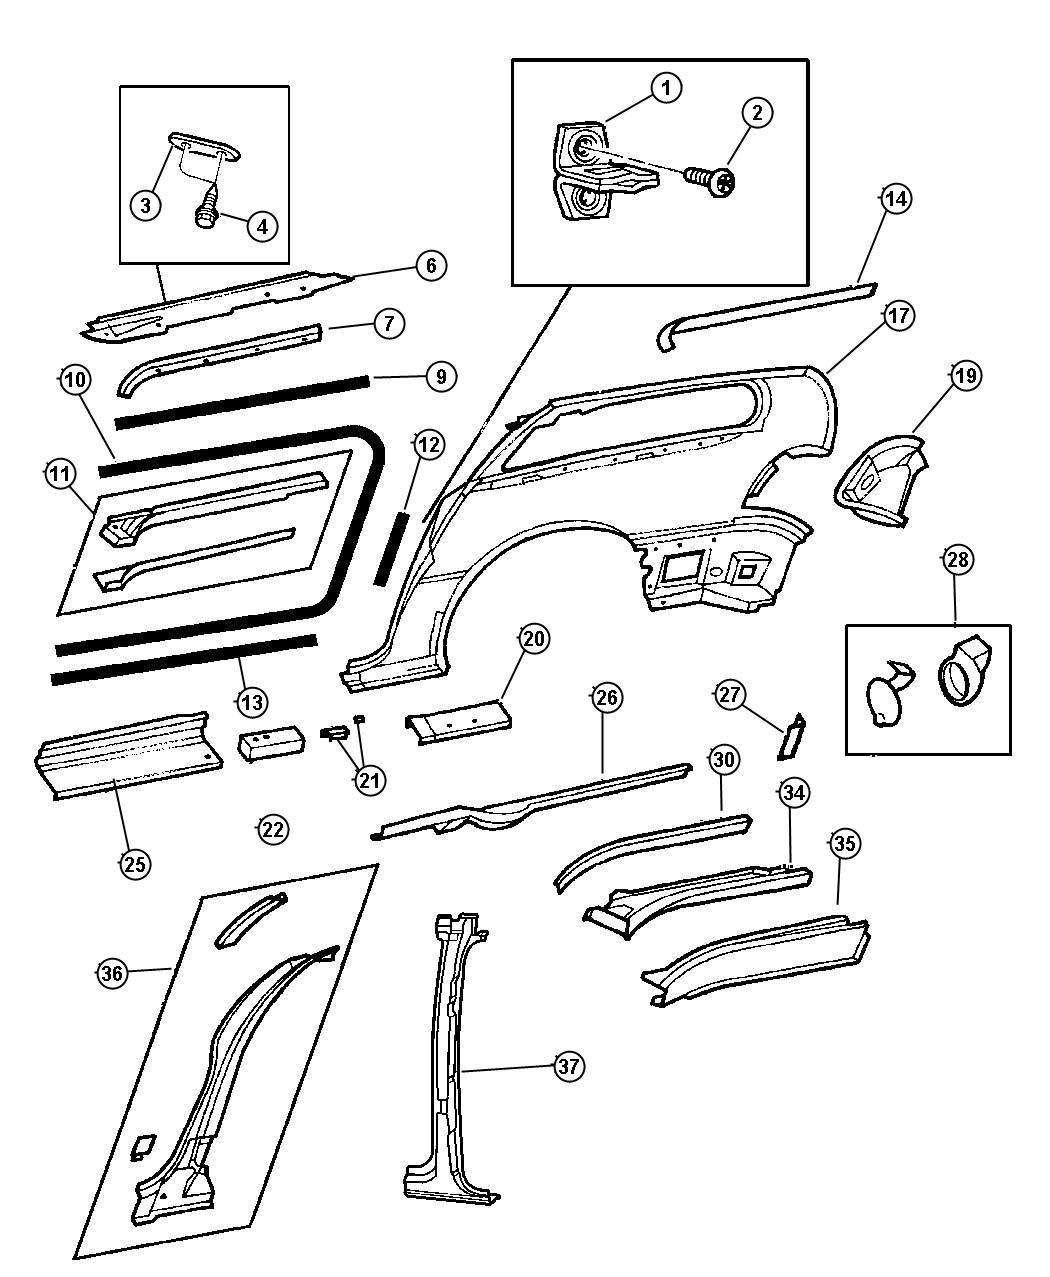 How To Remove Sliding Door Panel On Dodge Caravan: Dodge Caravan Weatherstrip. Right. Sliding Door